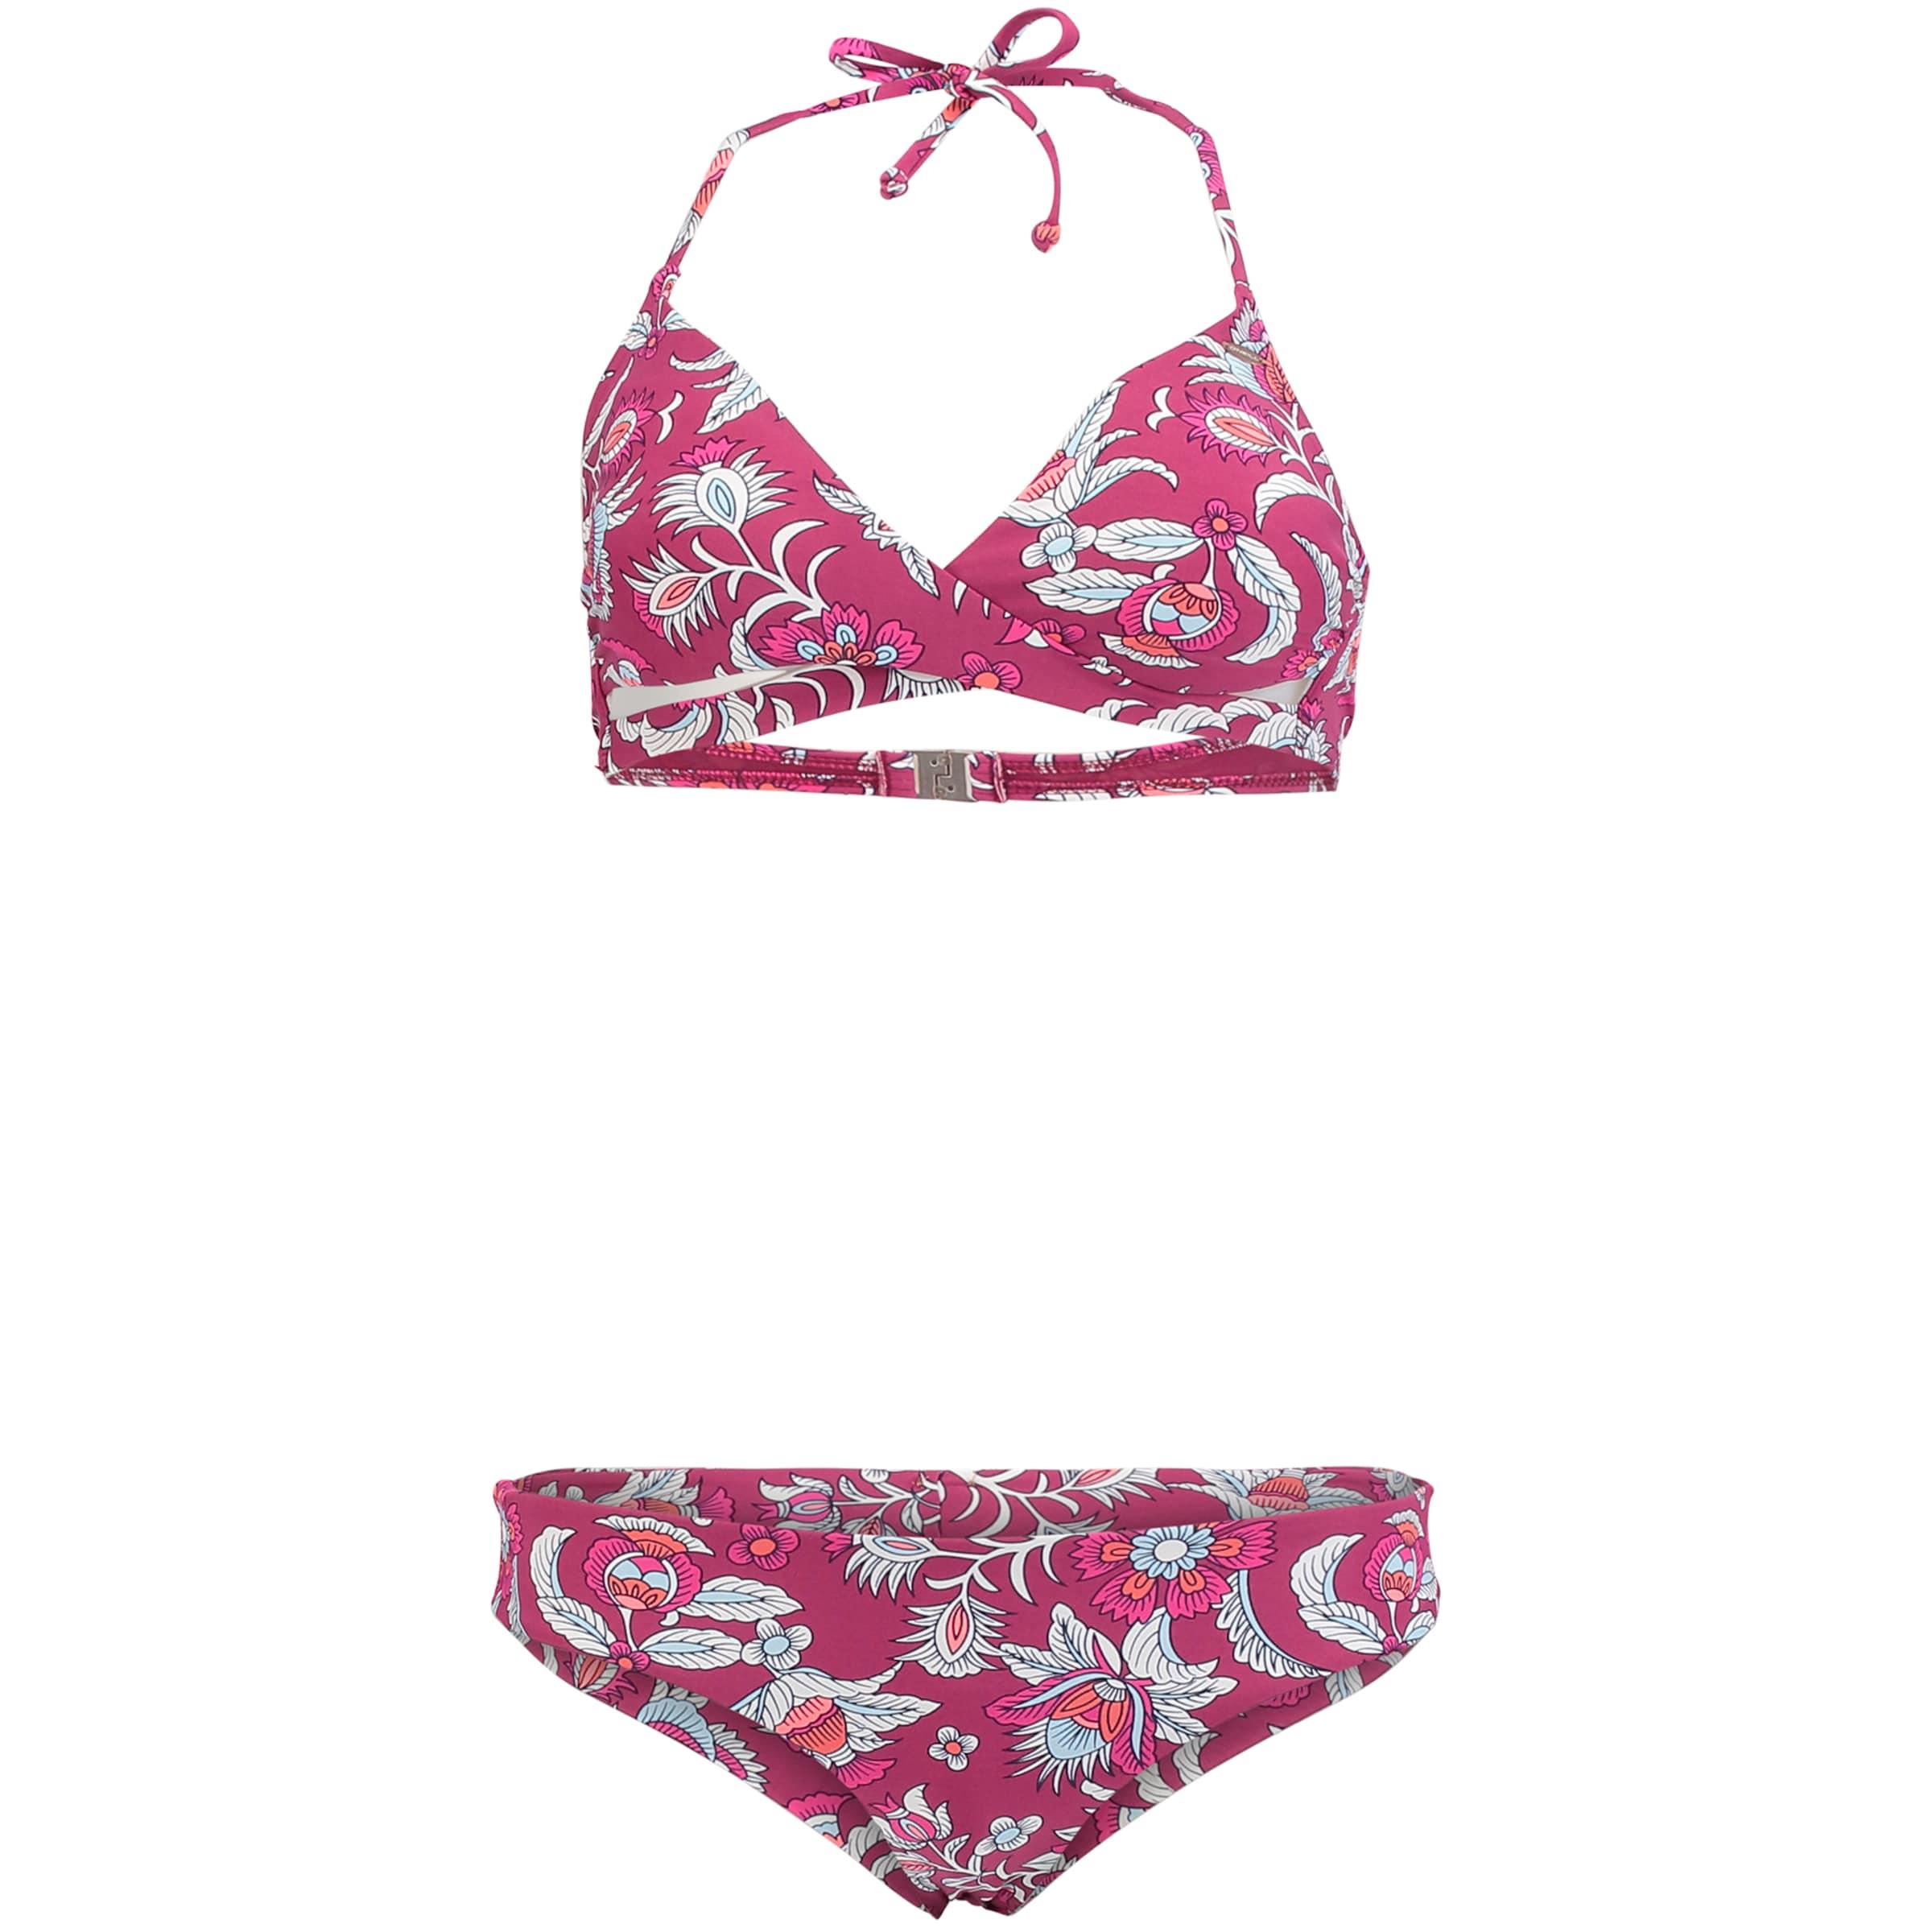 O'NEILL Bikini 'PW Print Crossover' Billig Verkauf 2018 Neue 0V6DX